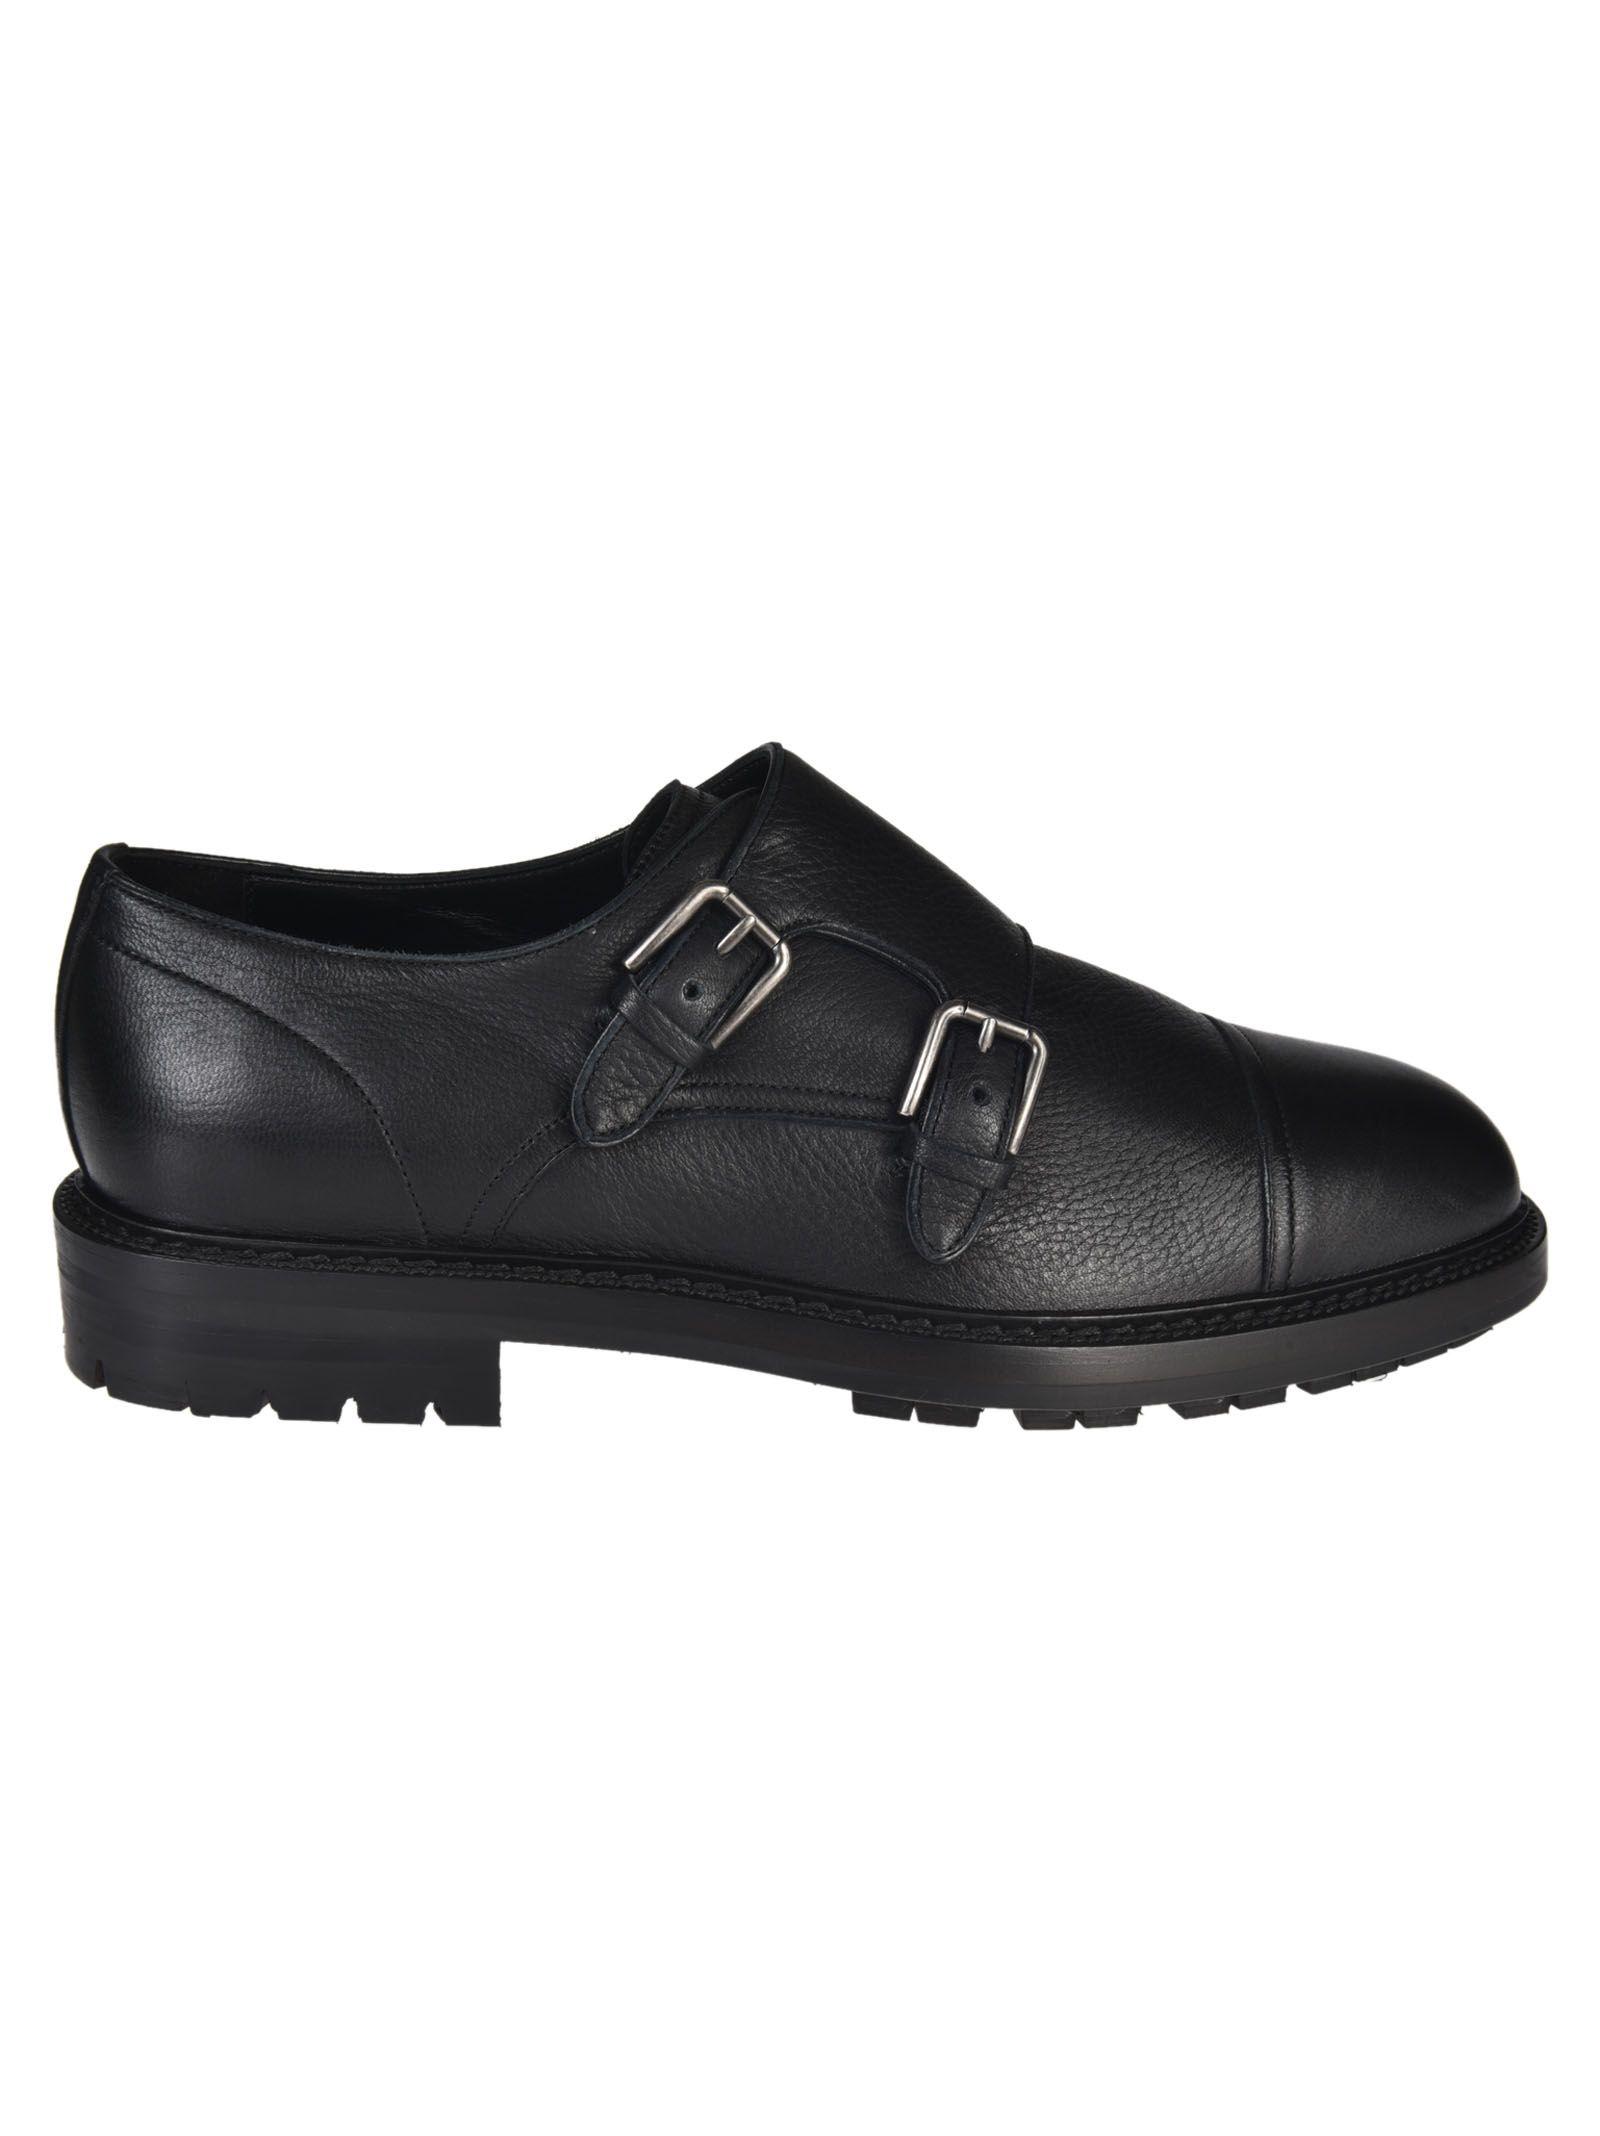 Dolce & Gabbana Classic Monk Shoes